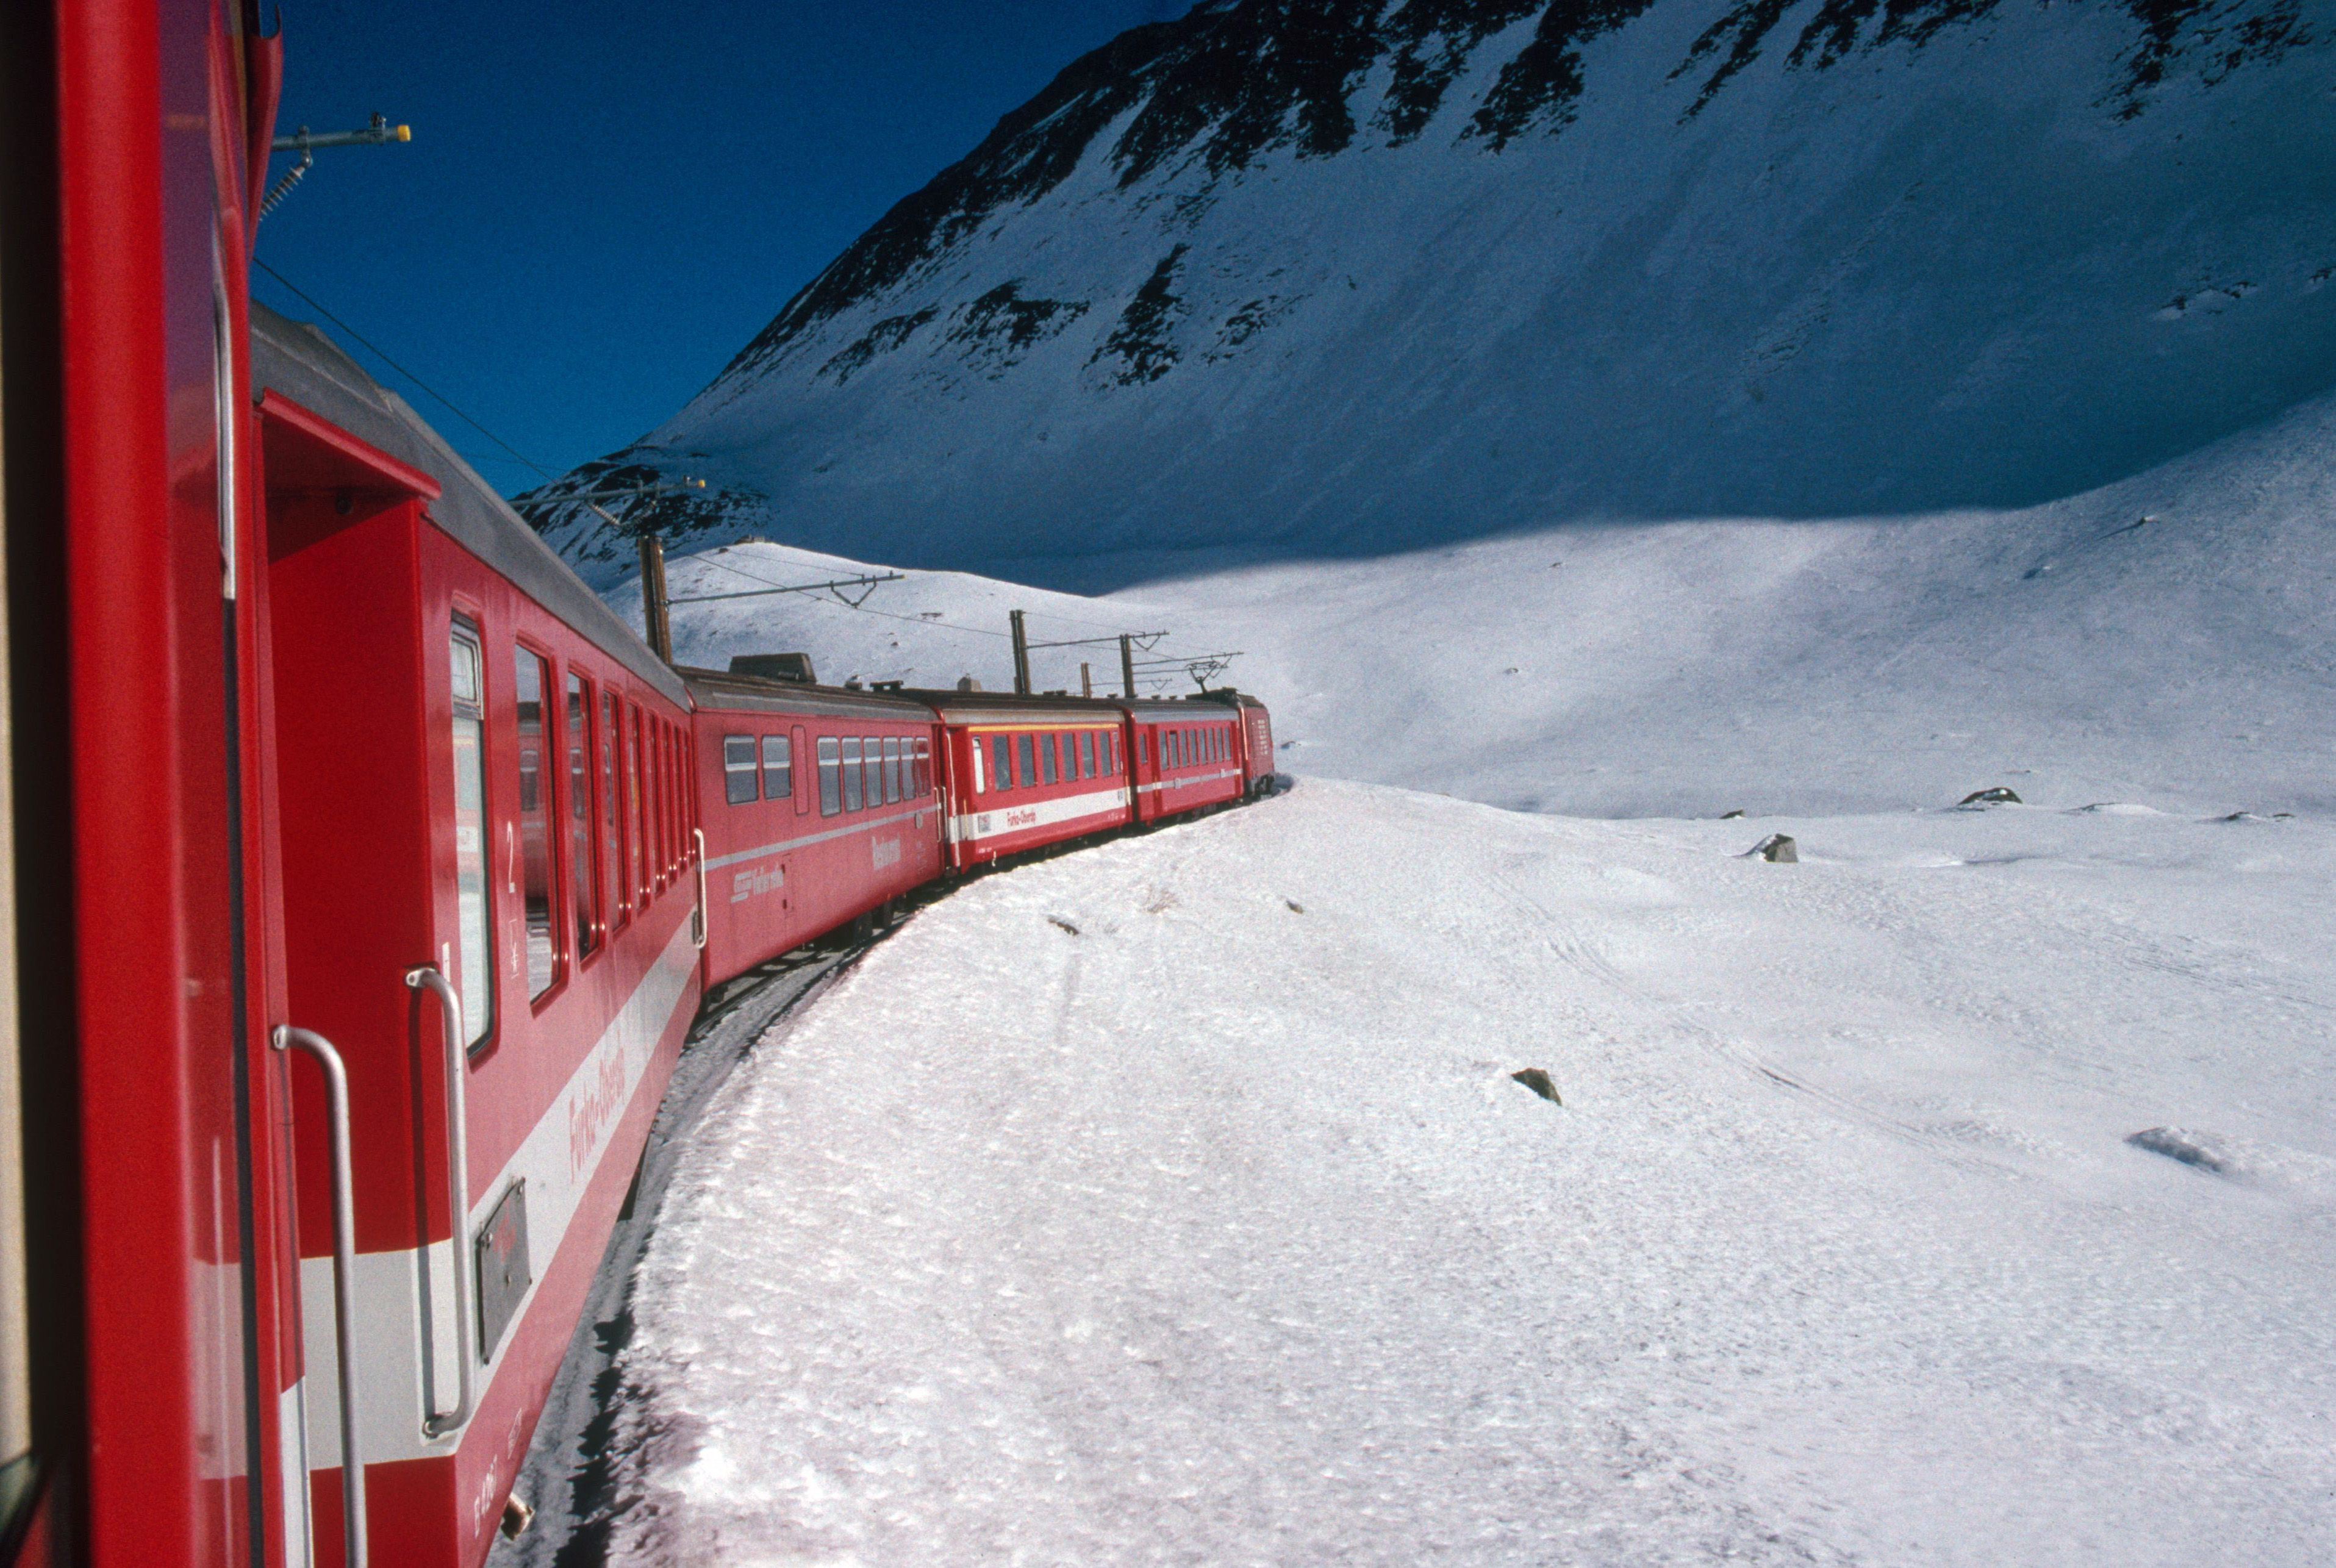 The Glacier Express travels from Zermatt to St. Moritz, in Switzerland.